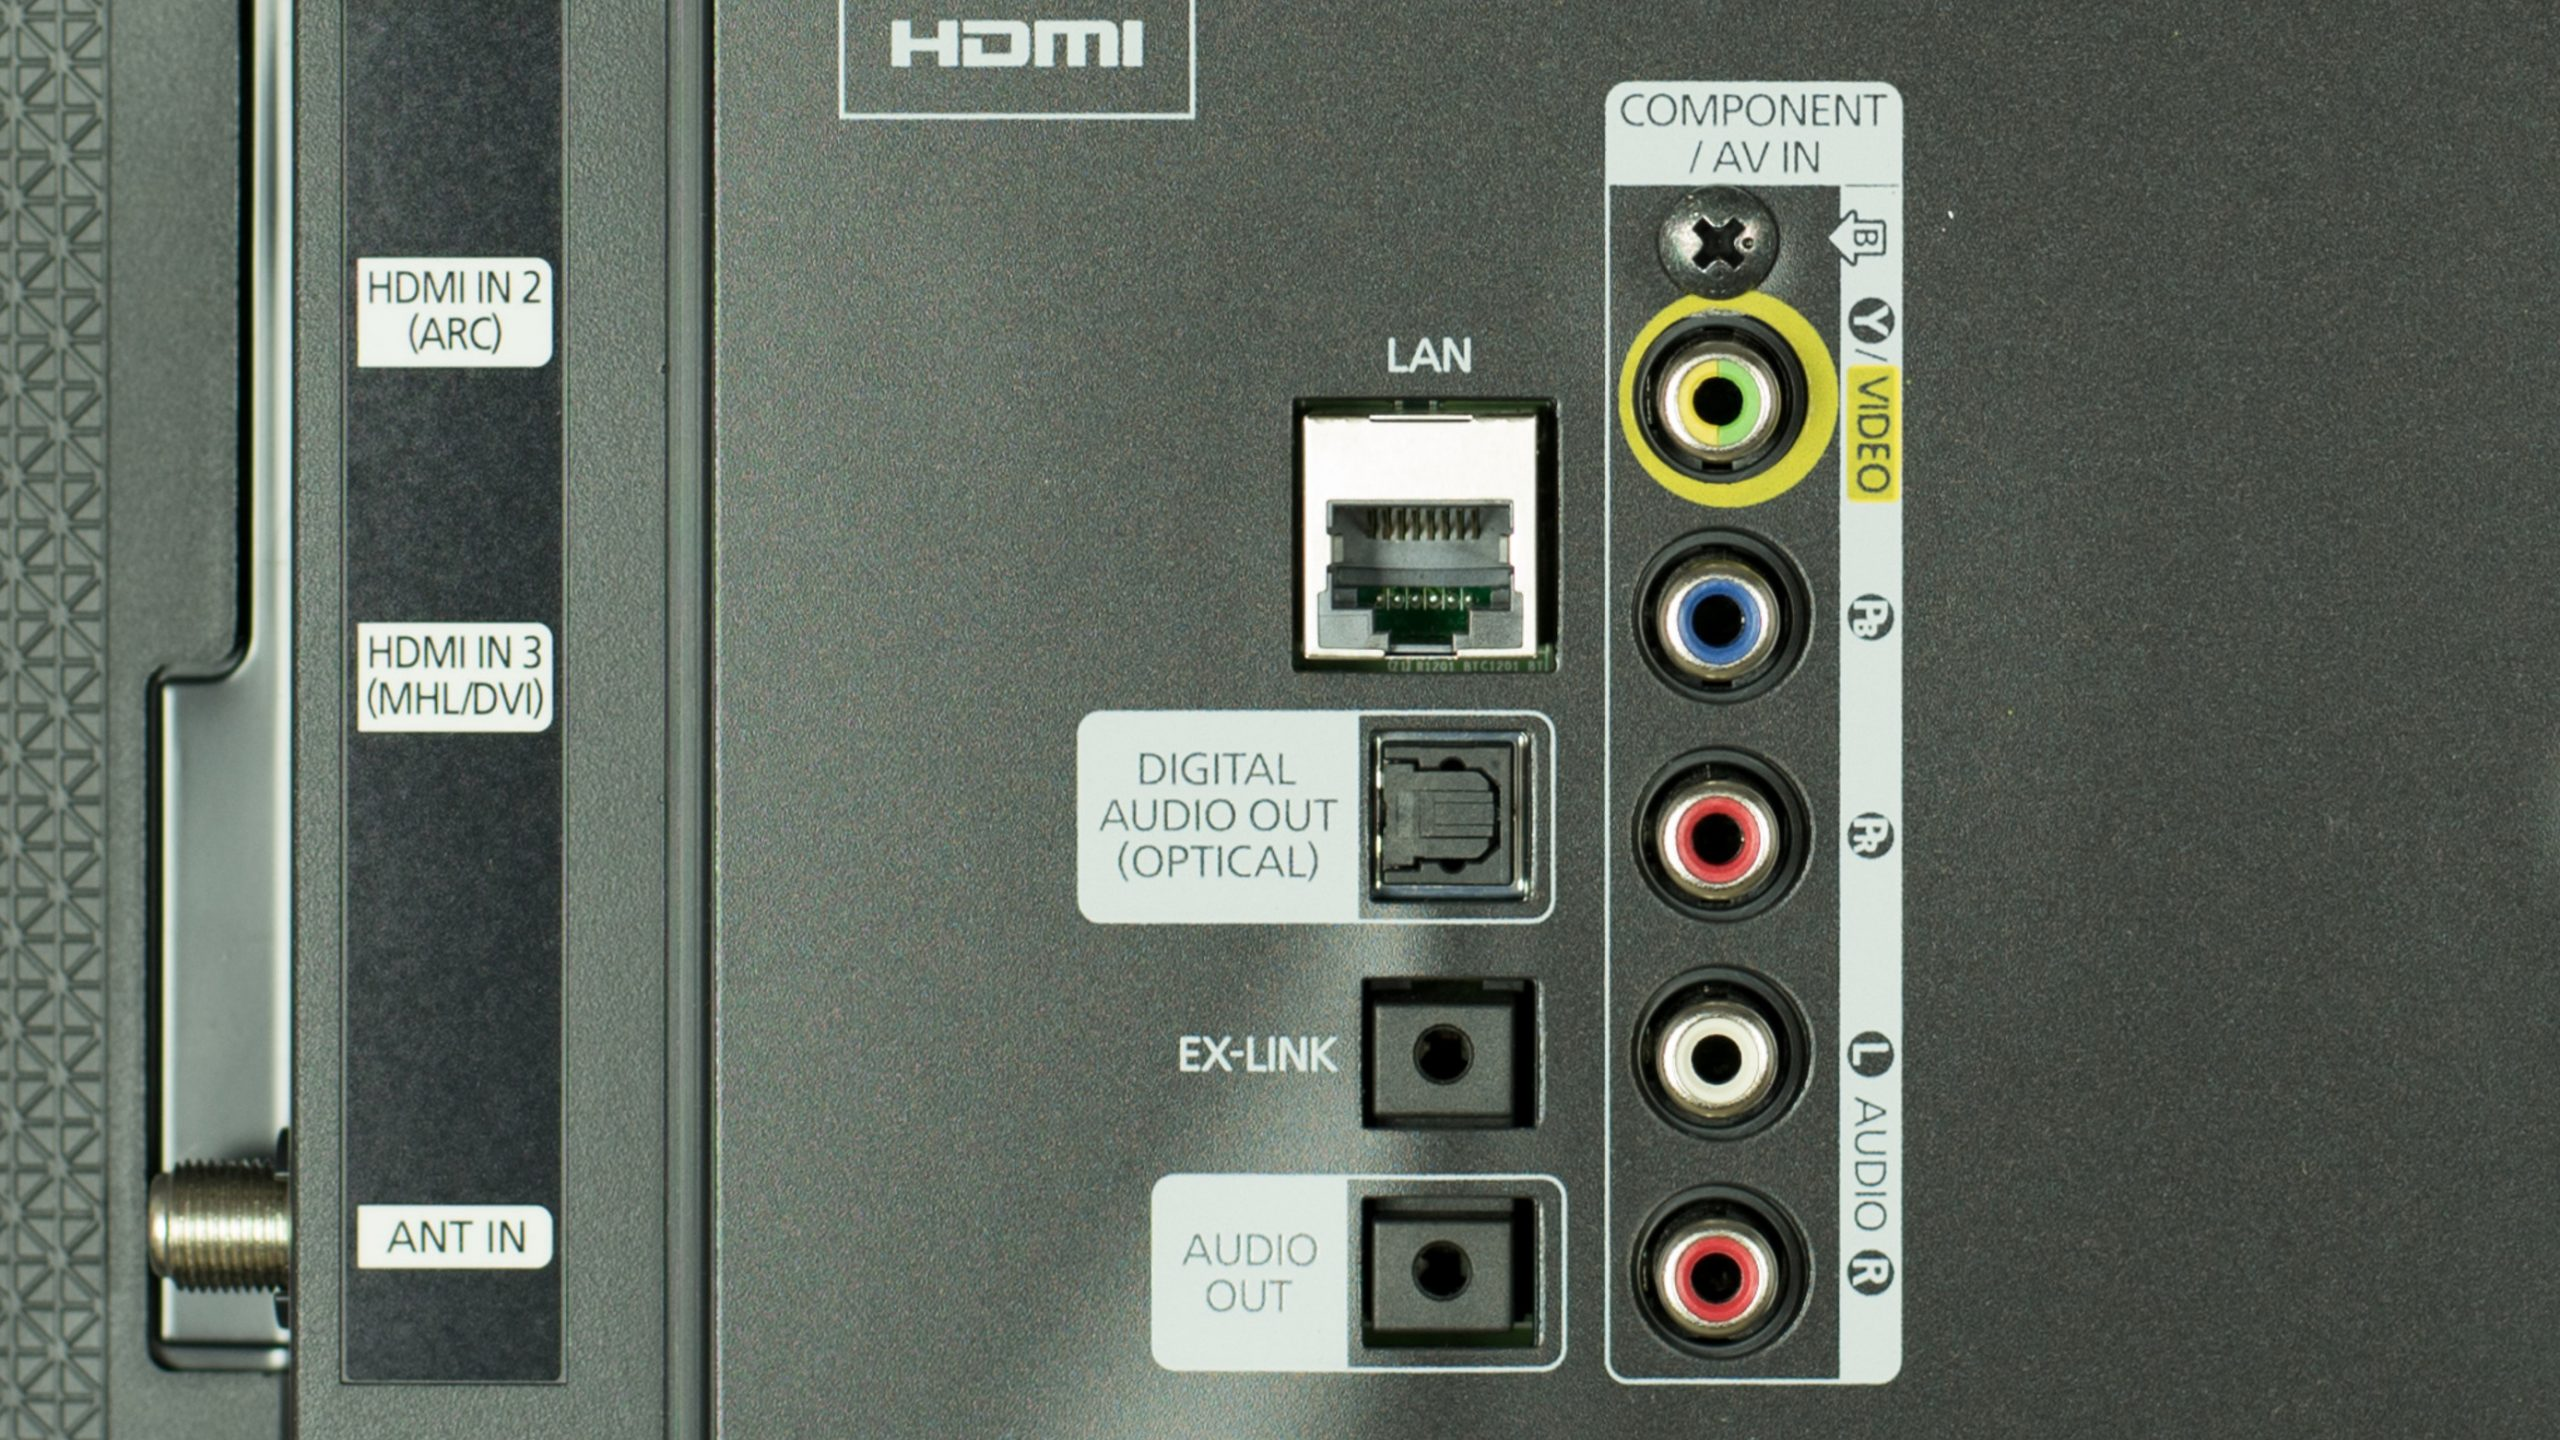 Smart TV ethernet rear panel